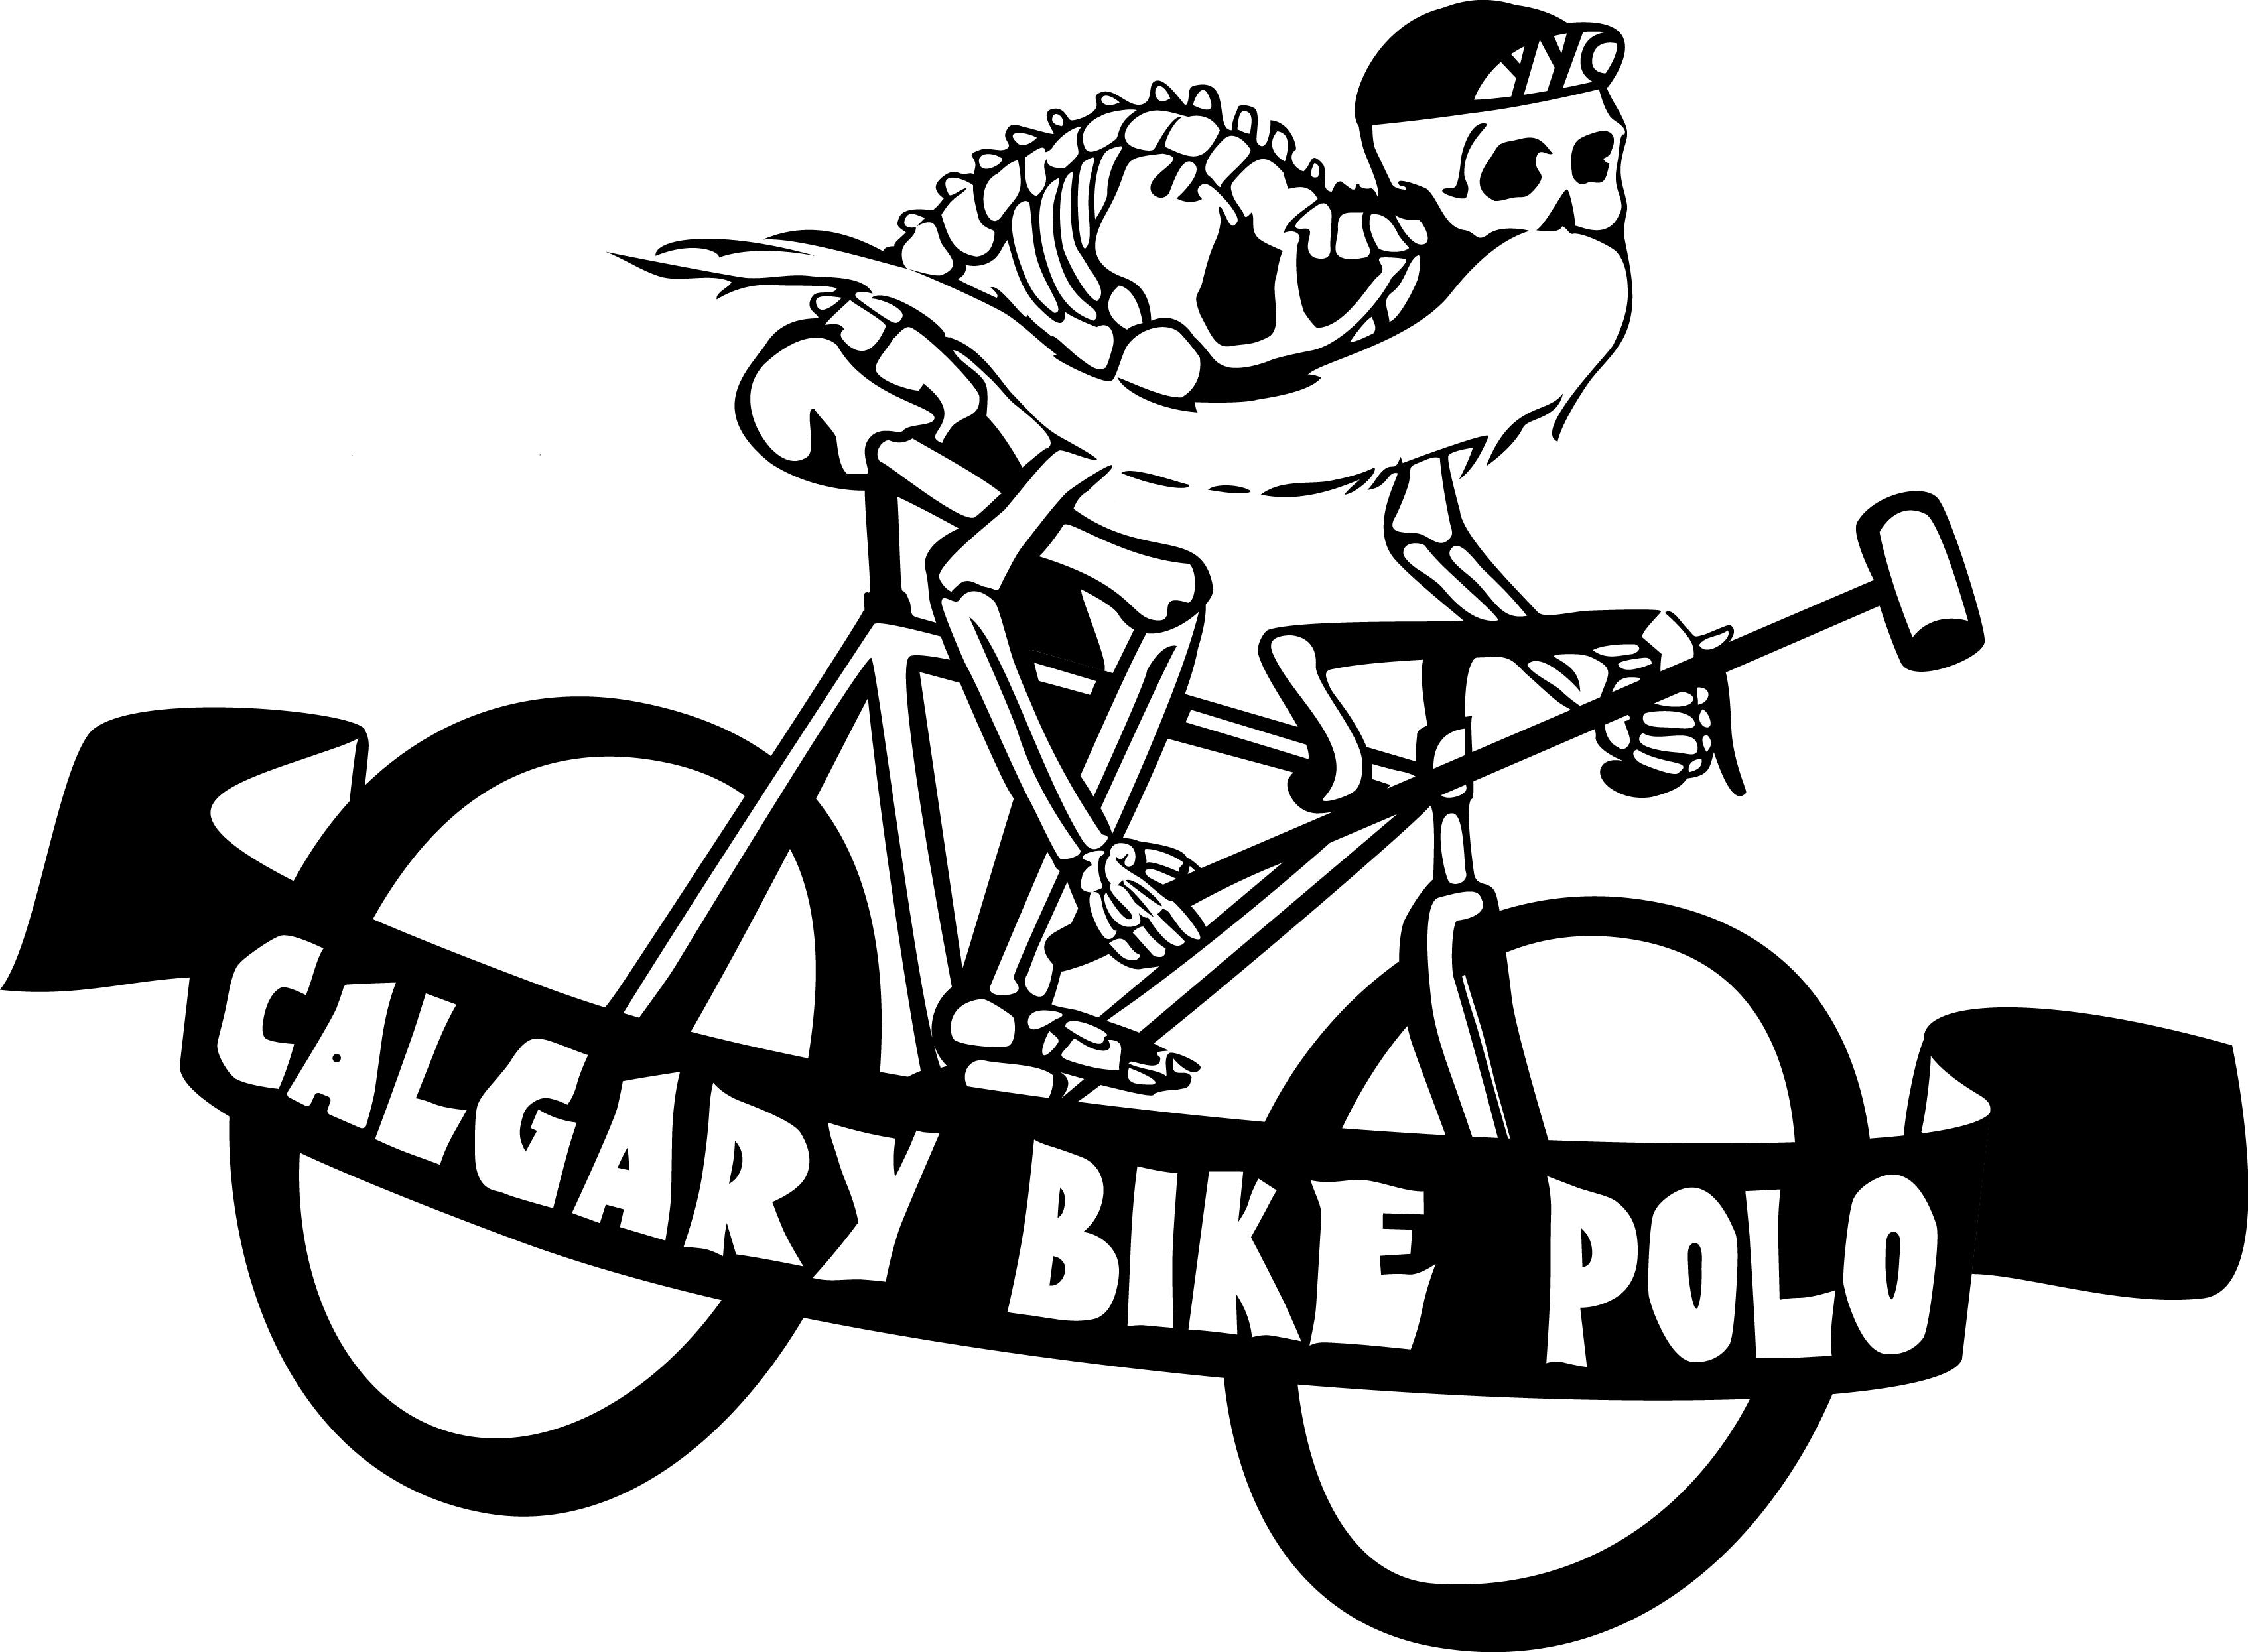 calgary_bike_polo_2016.jpg